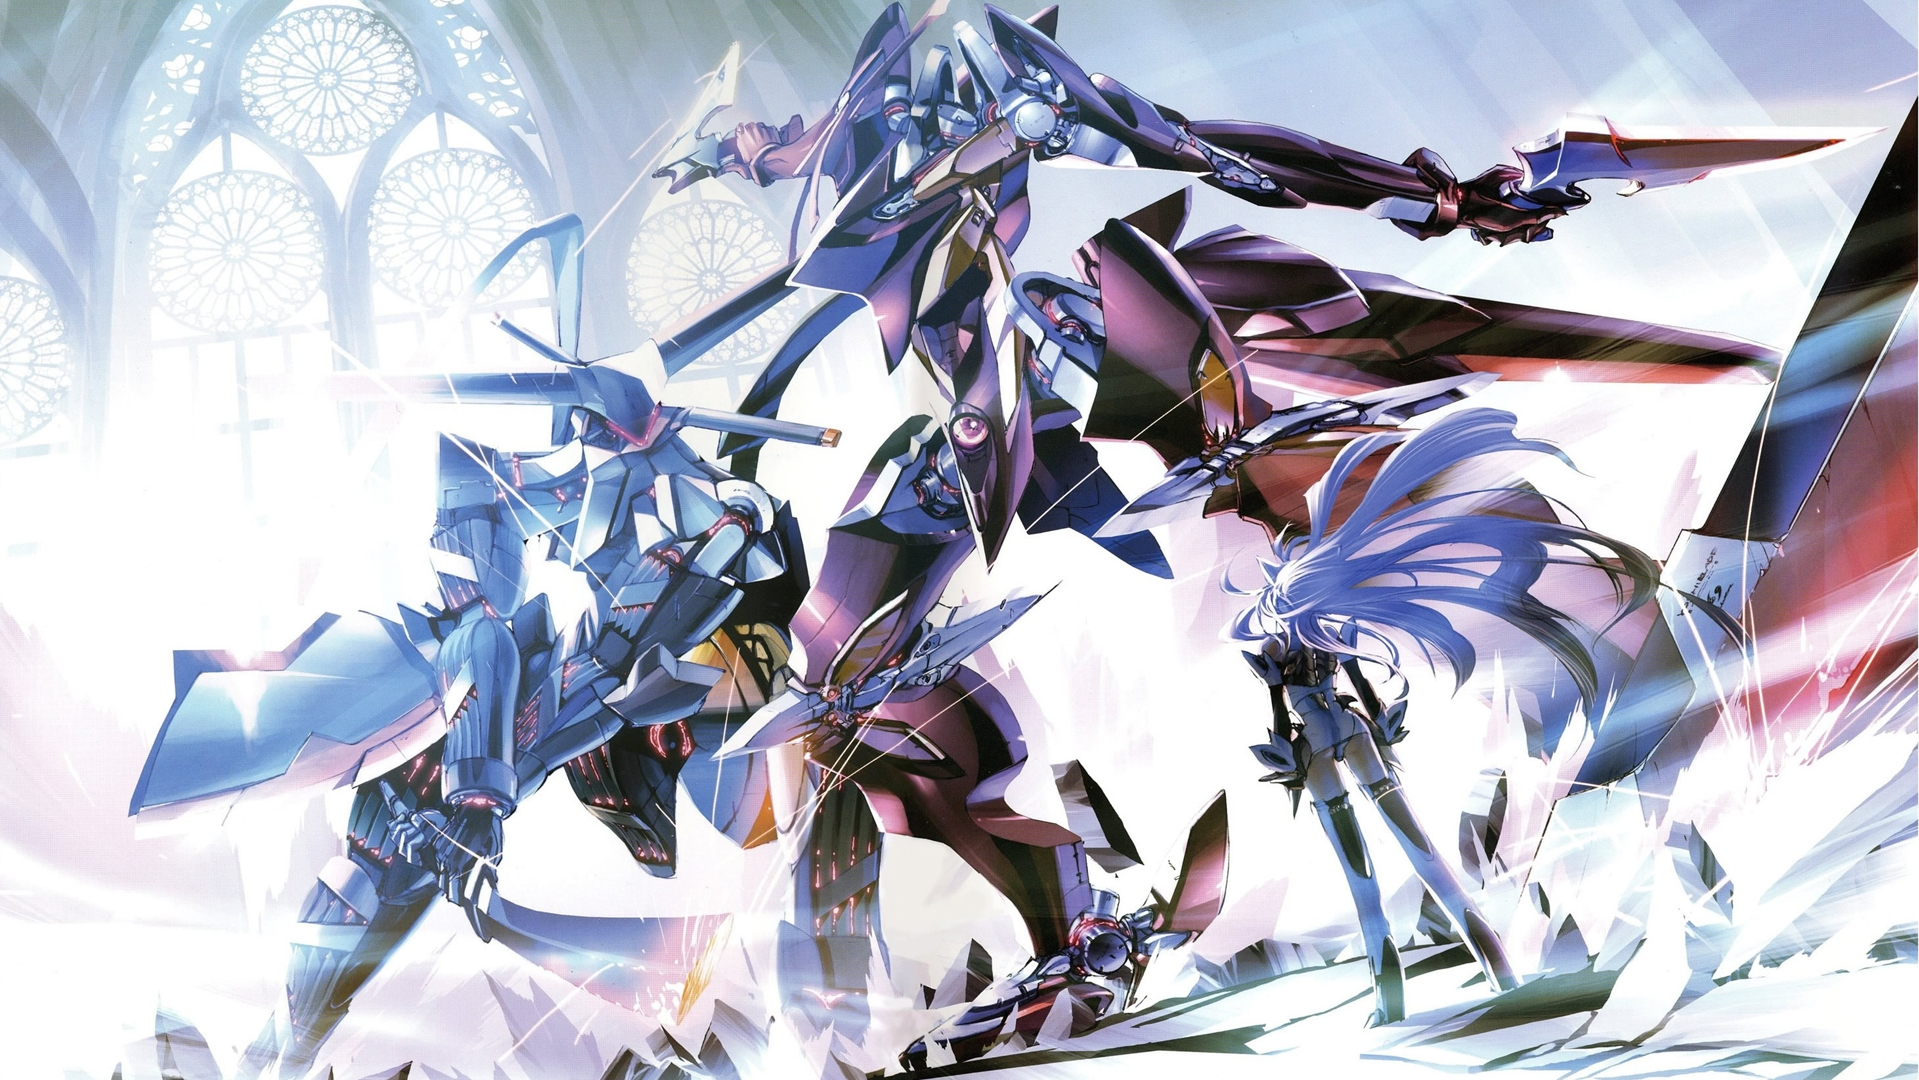 Epic Anime Wallpapers HD - WallpaperSafari Epic Girls Wallpapers